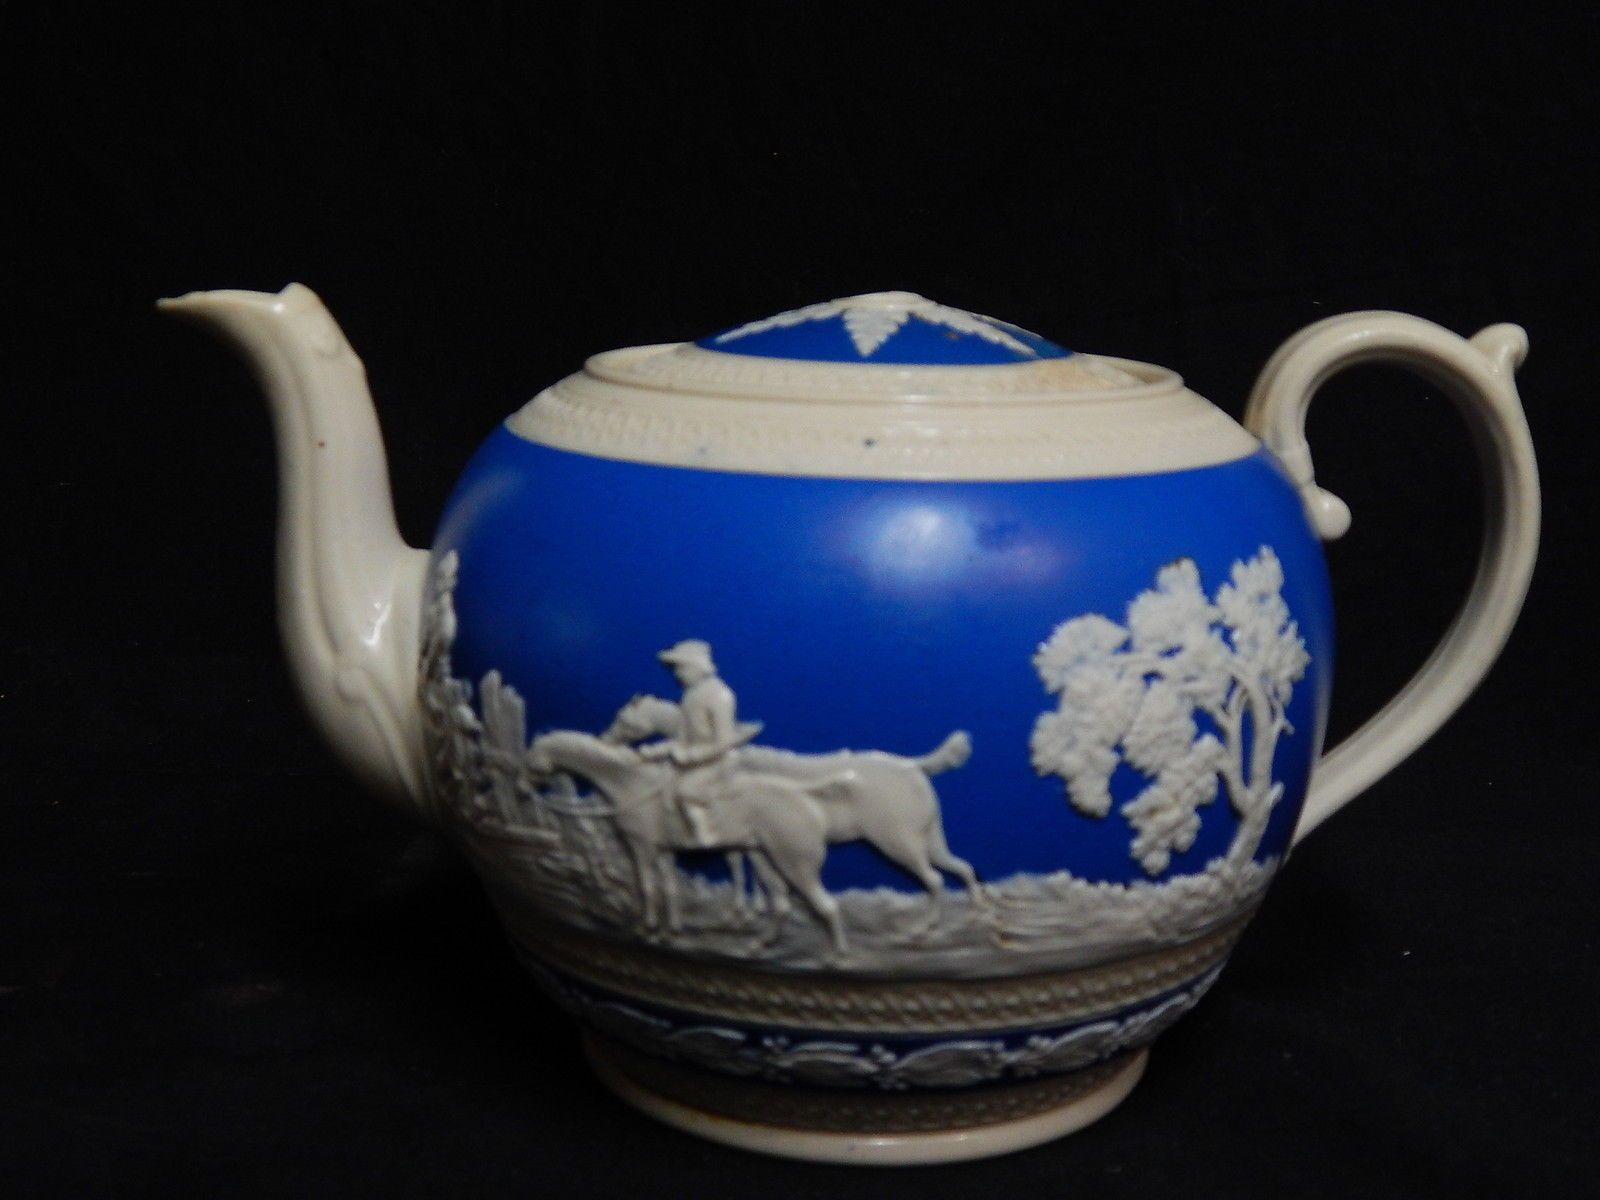 Vintage Copeland Spode Teapot England As Is - Ebay